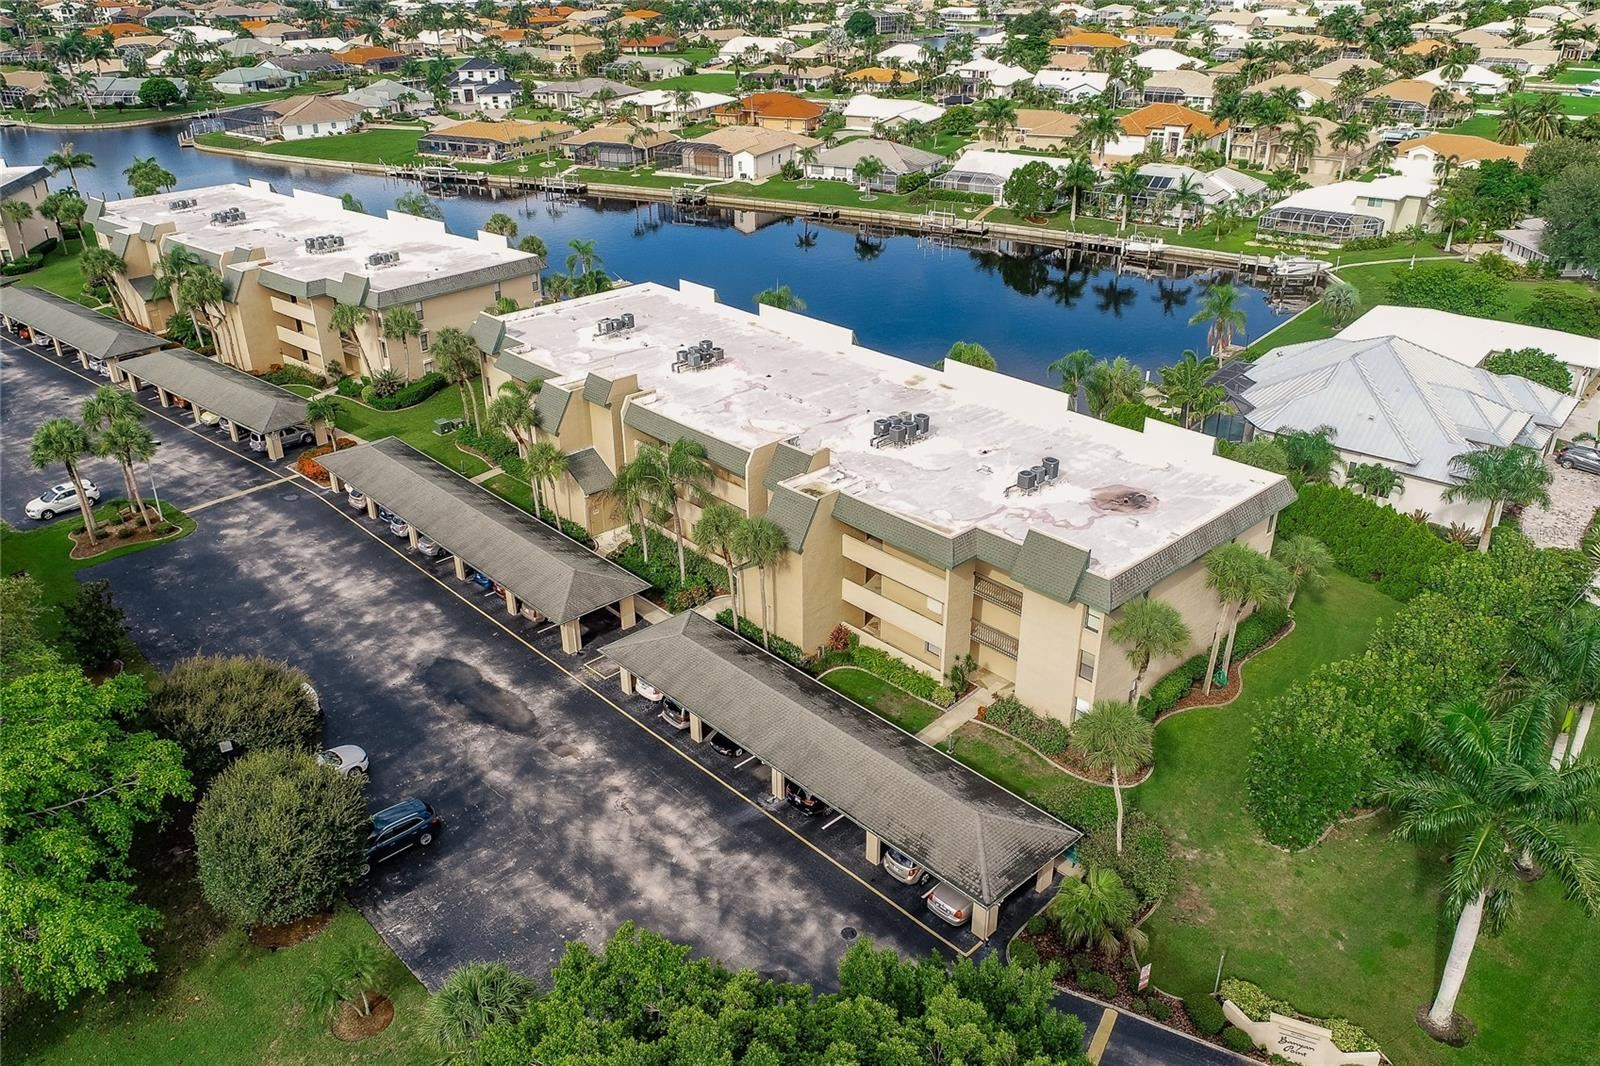 601 SHREVE STREET #14B, Punta Gorda, FL 33950 - MLS#: C7445471